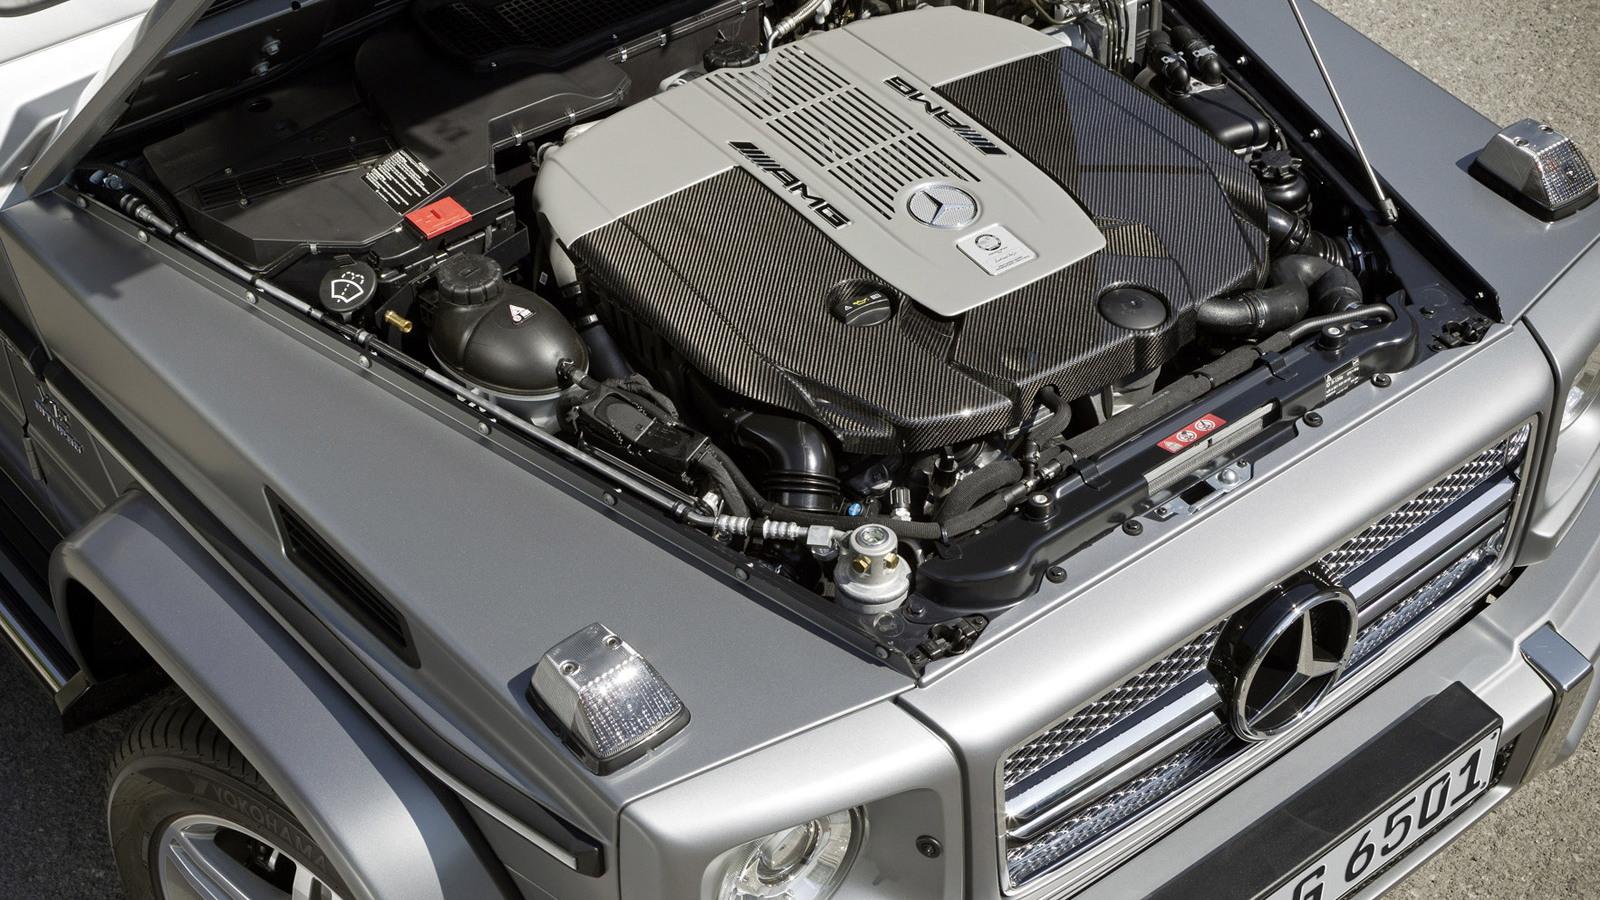 2013 Mercedes-Benz G65 AMG